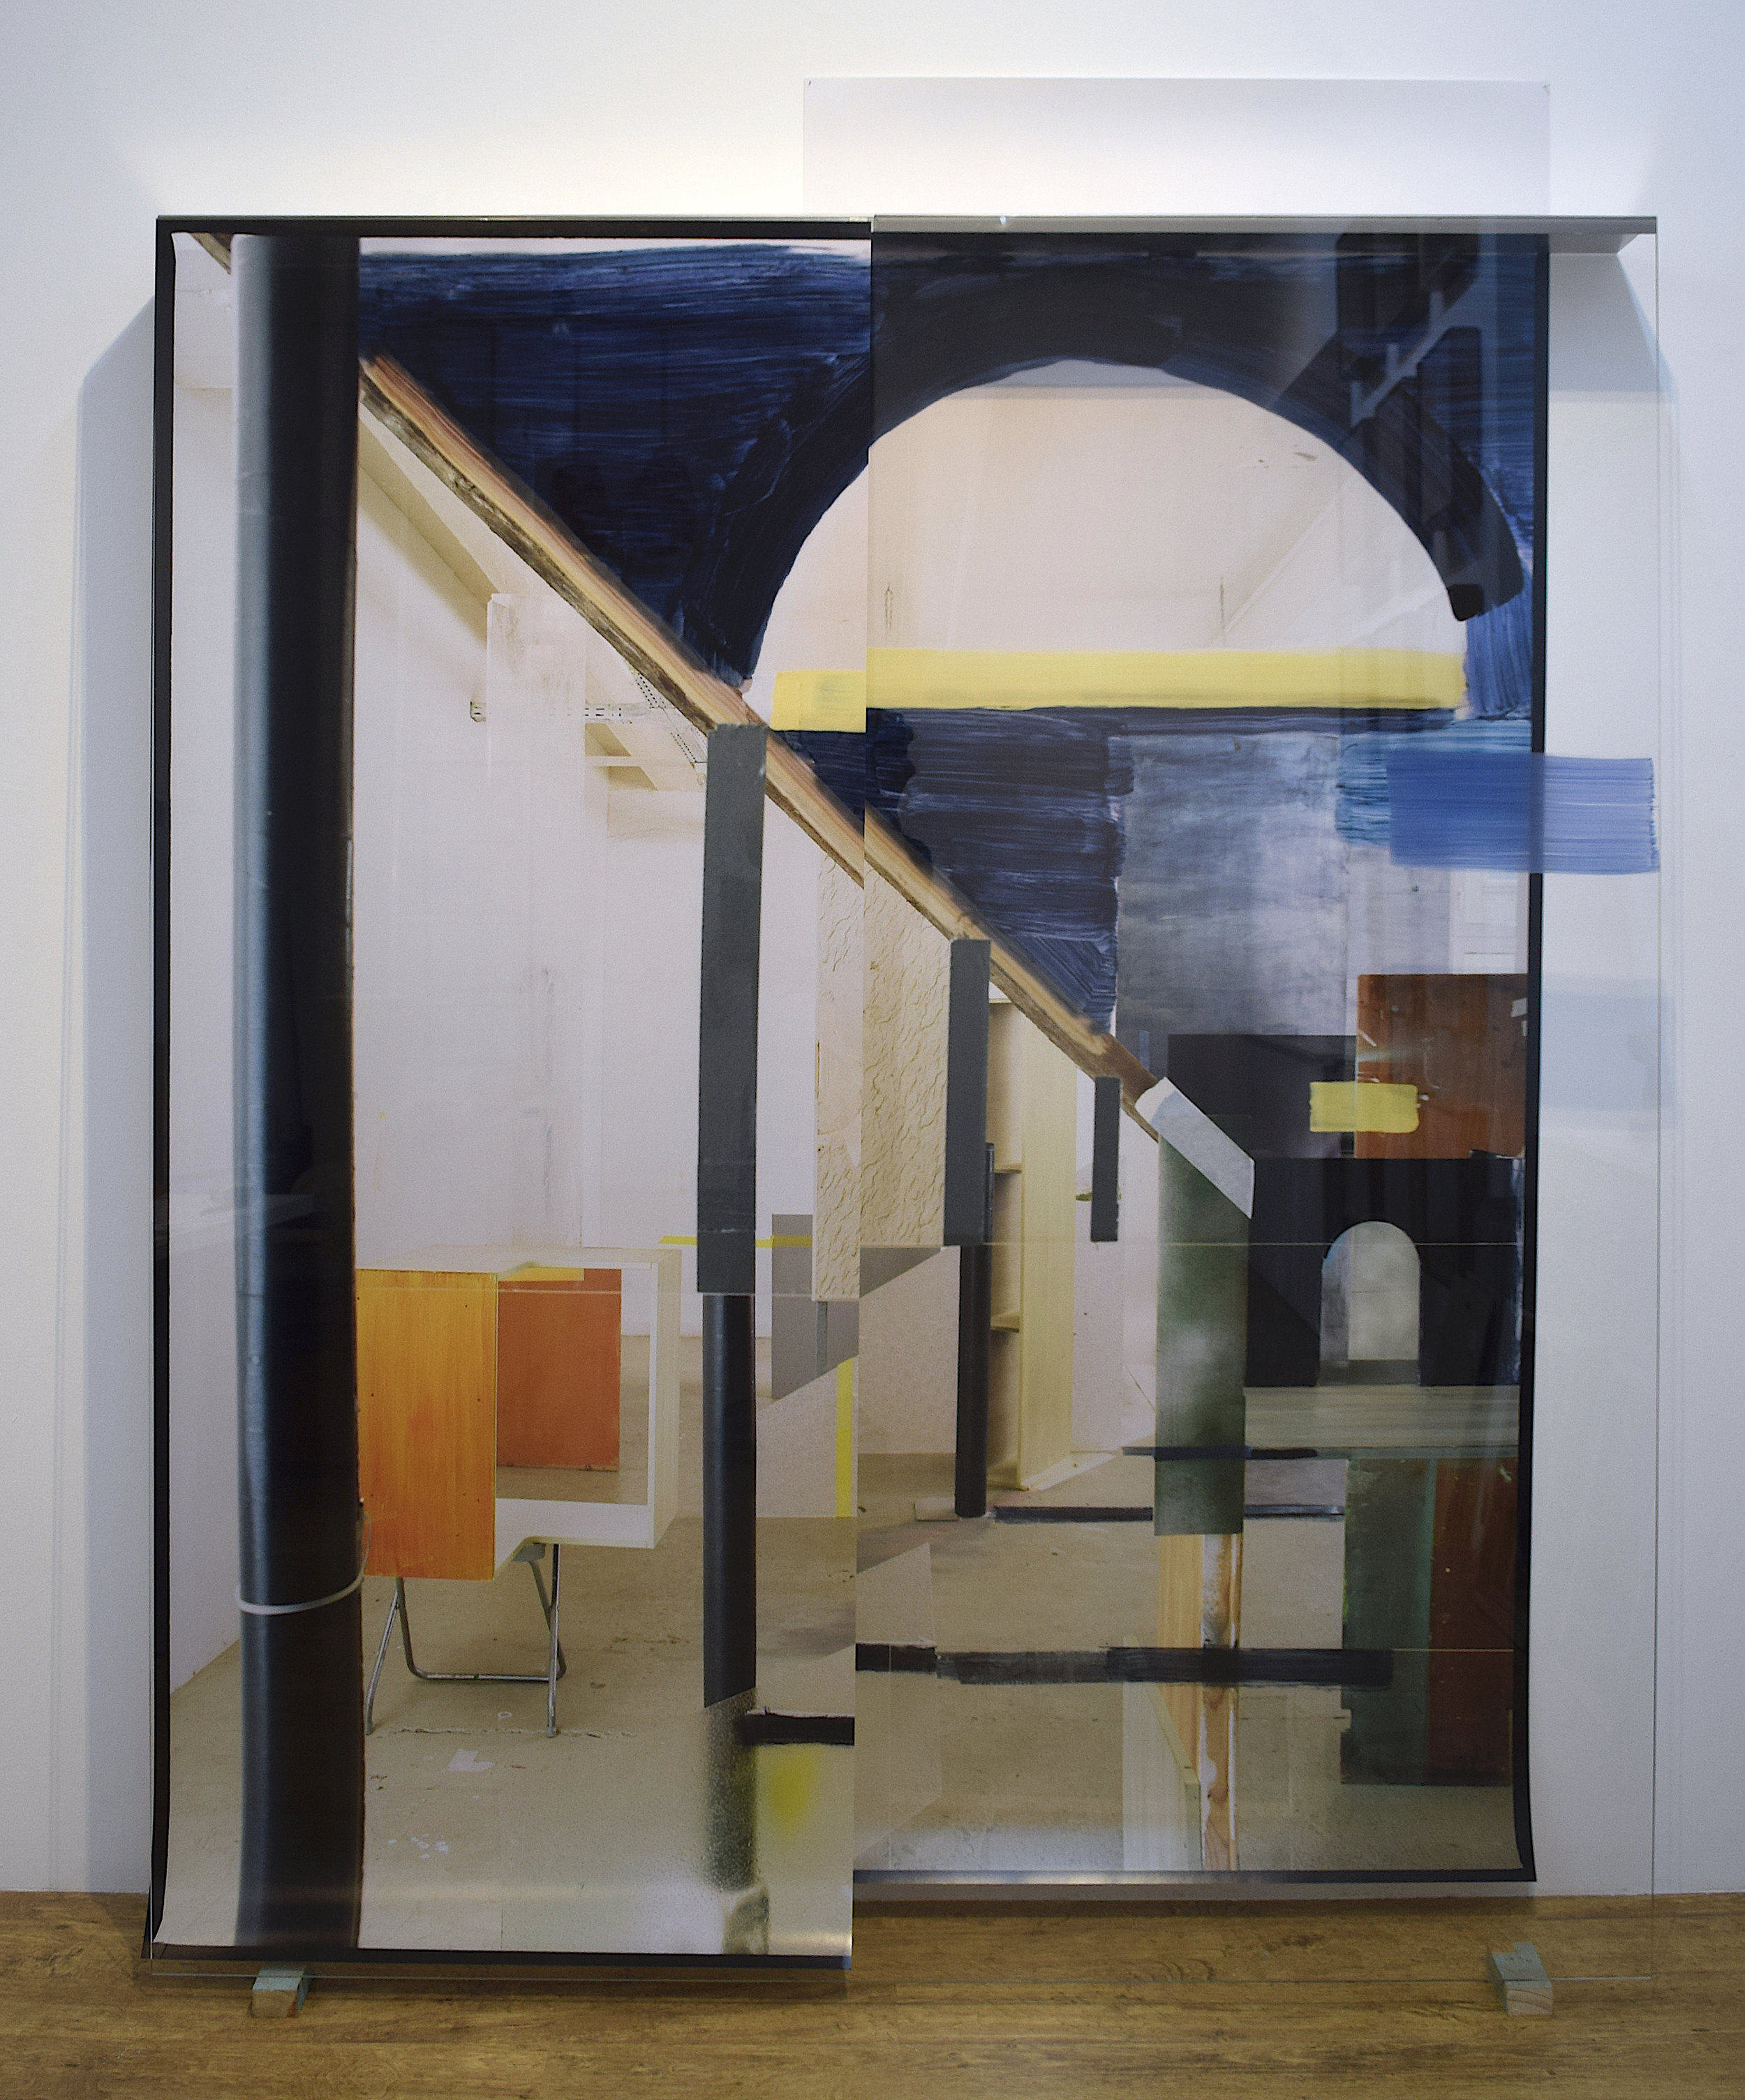 Heike Gallmeier,  Projective Geometry 3 , 2018, C-Print, acrylic paint, glass, aluminium, wood 180 x, 220 x 15 cm